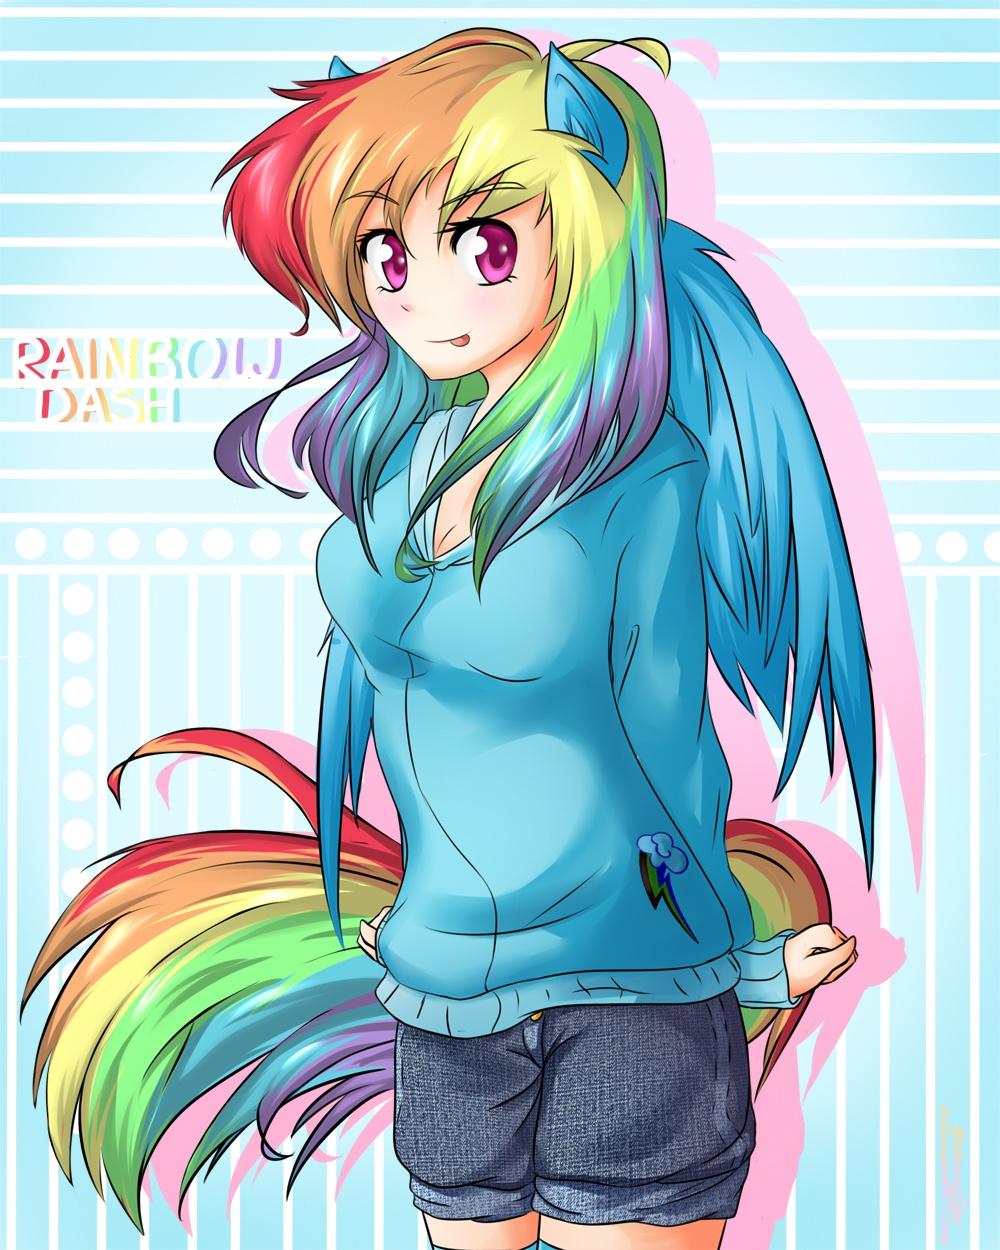 Rainbow Dash - My Little Pony - Image #1319709 - Zerochan ...